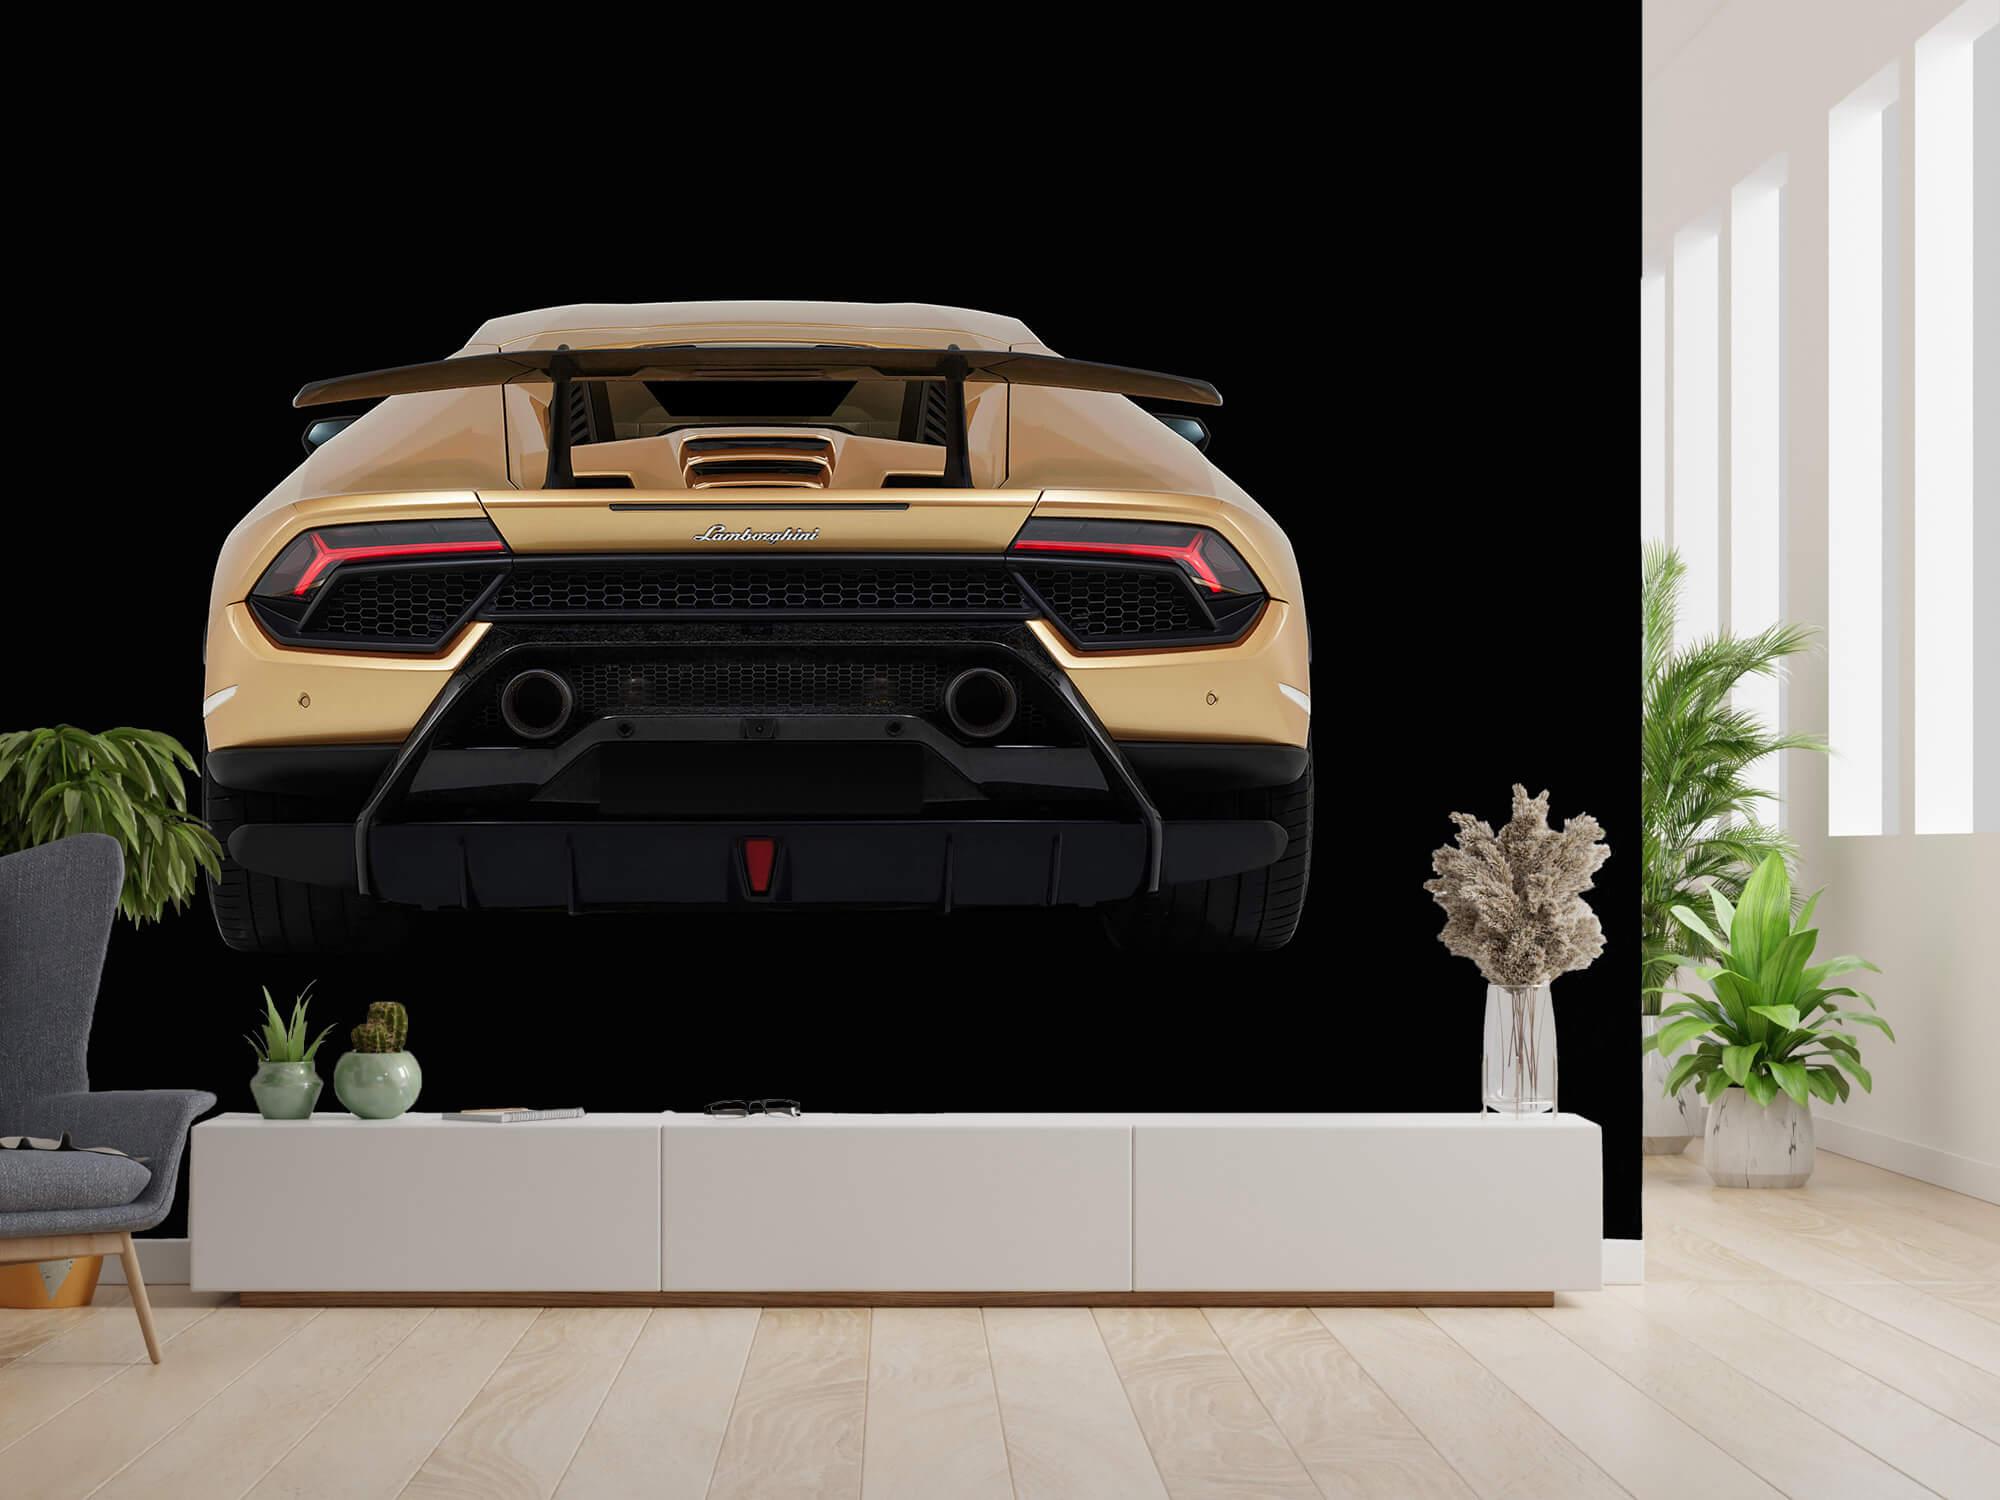 Wallpaper Lamborghini Huracán - Rear view, black 2